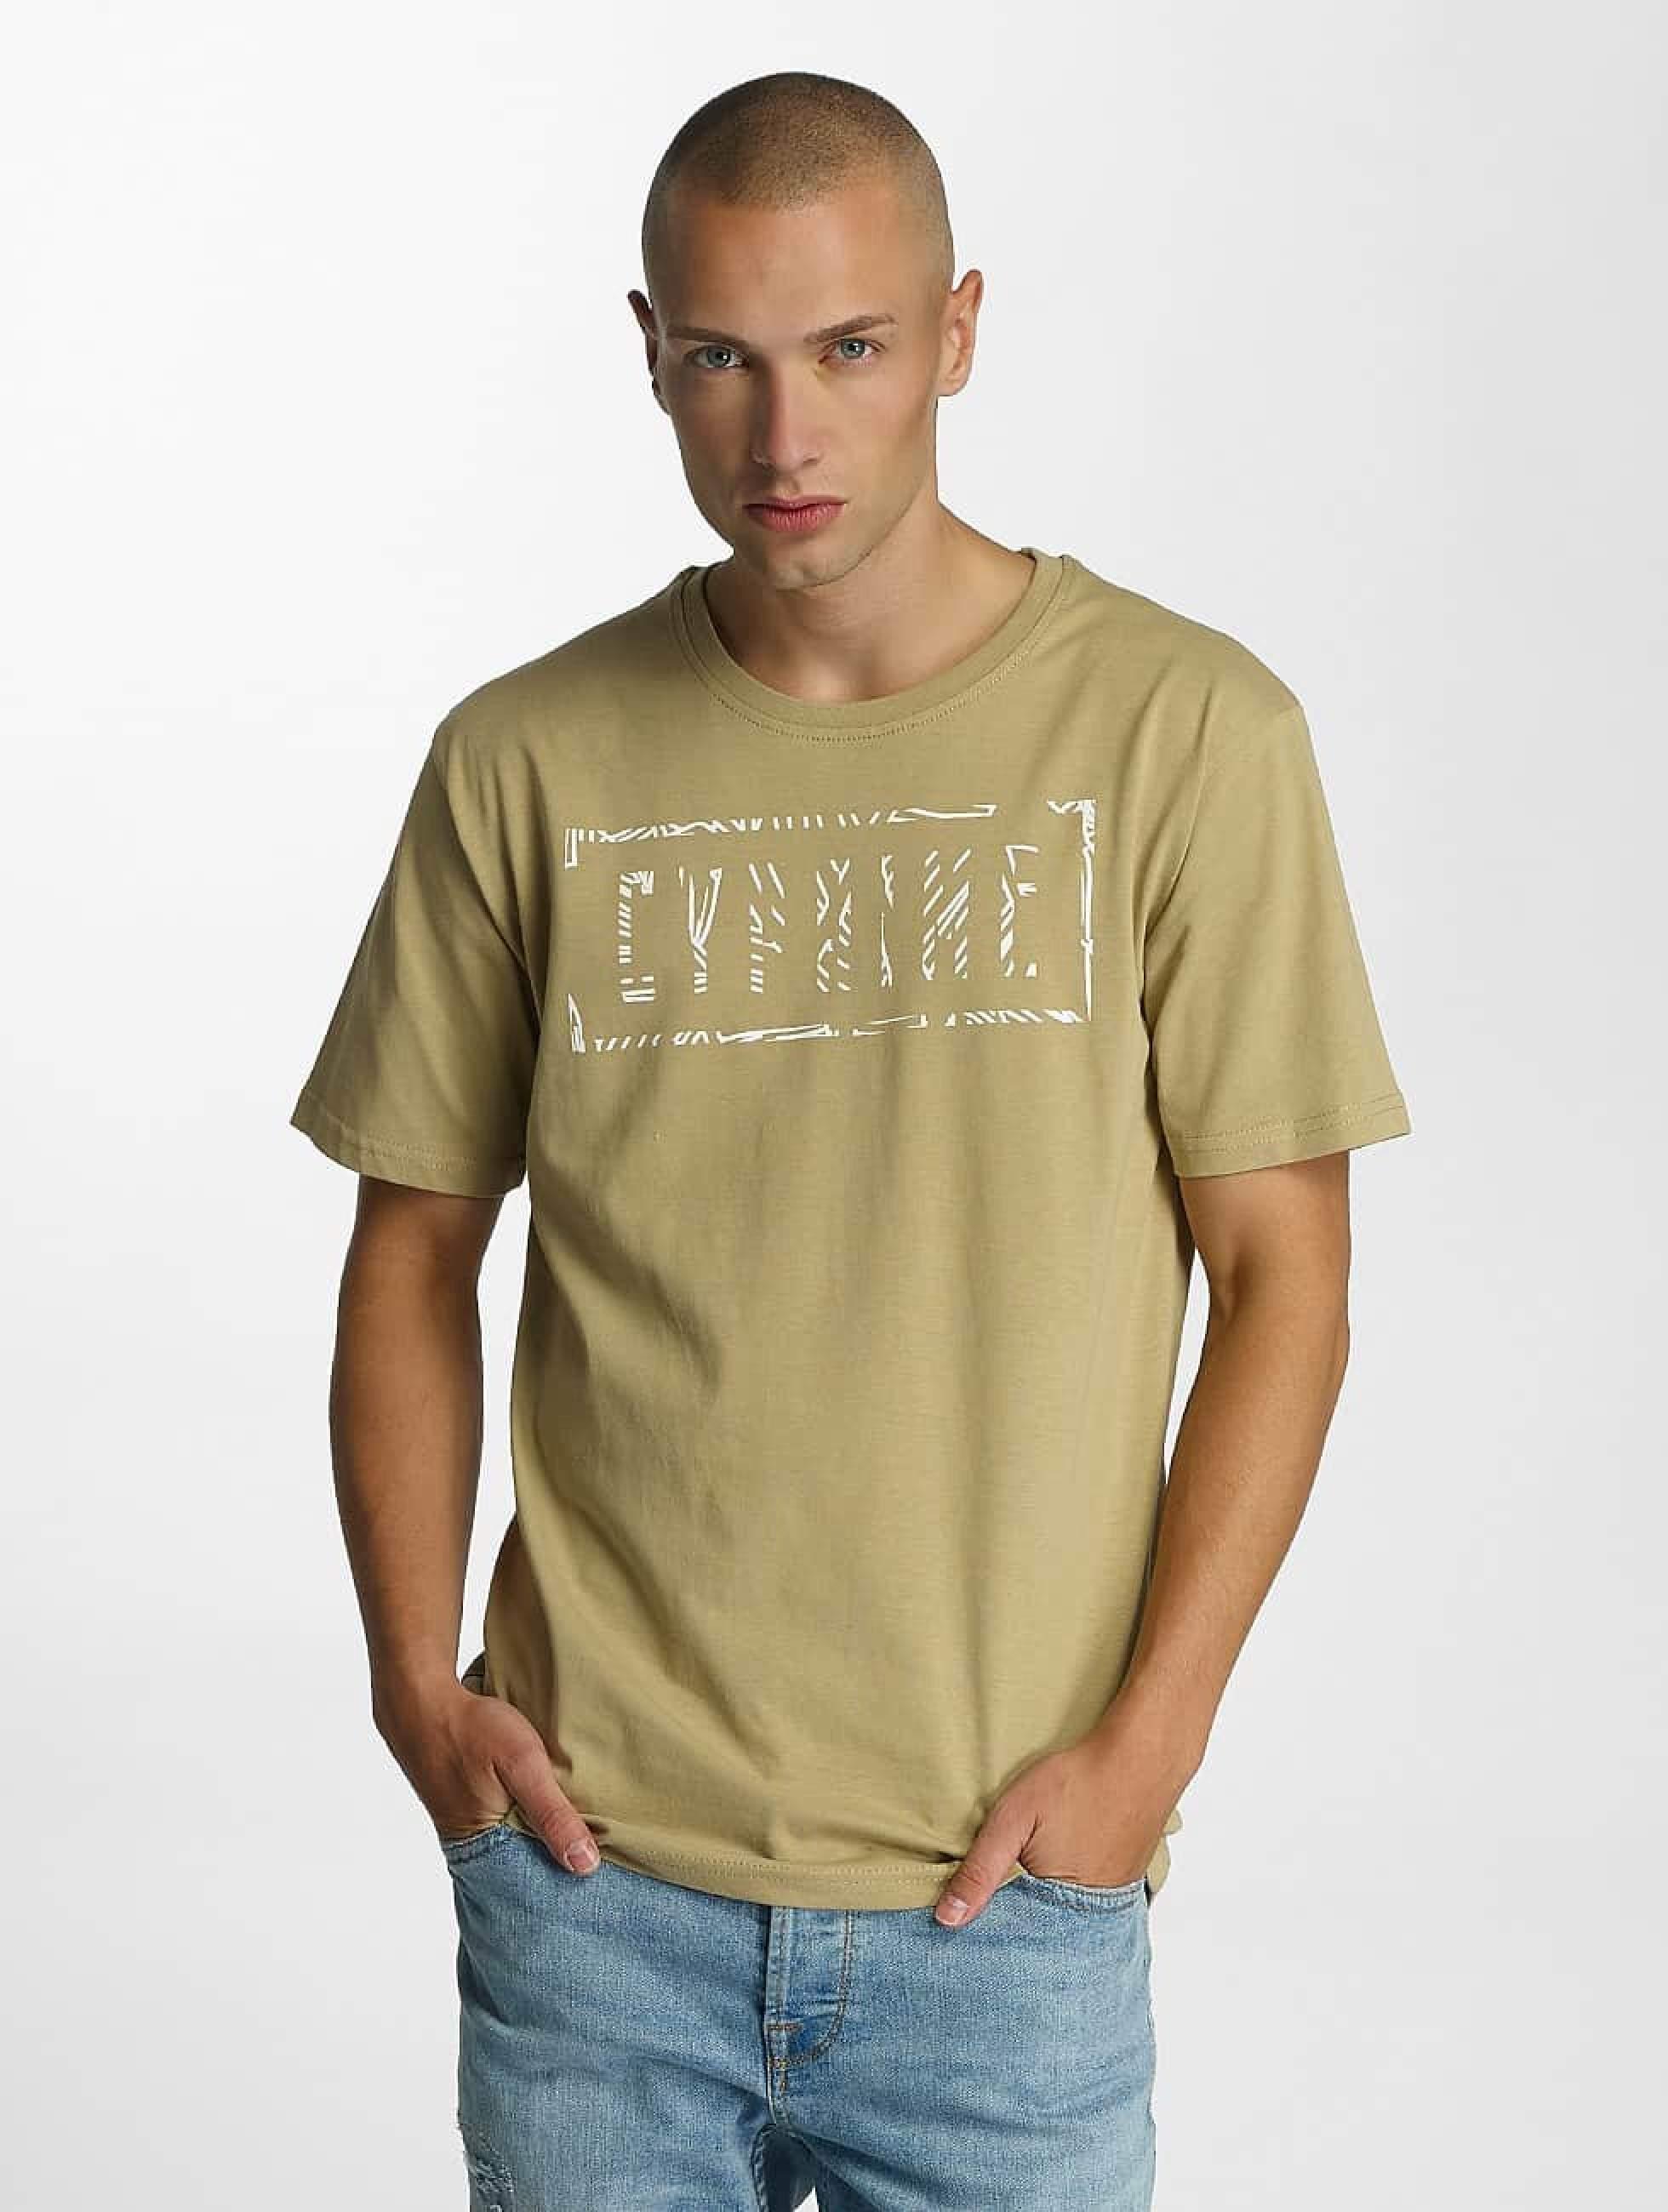 Cyprime / T-Shirt Cerium in beige S